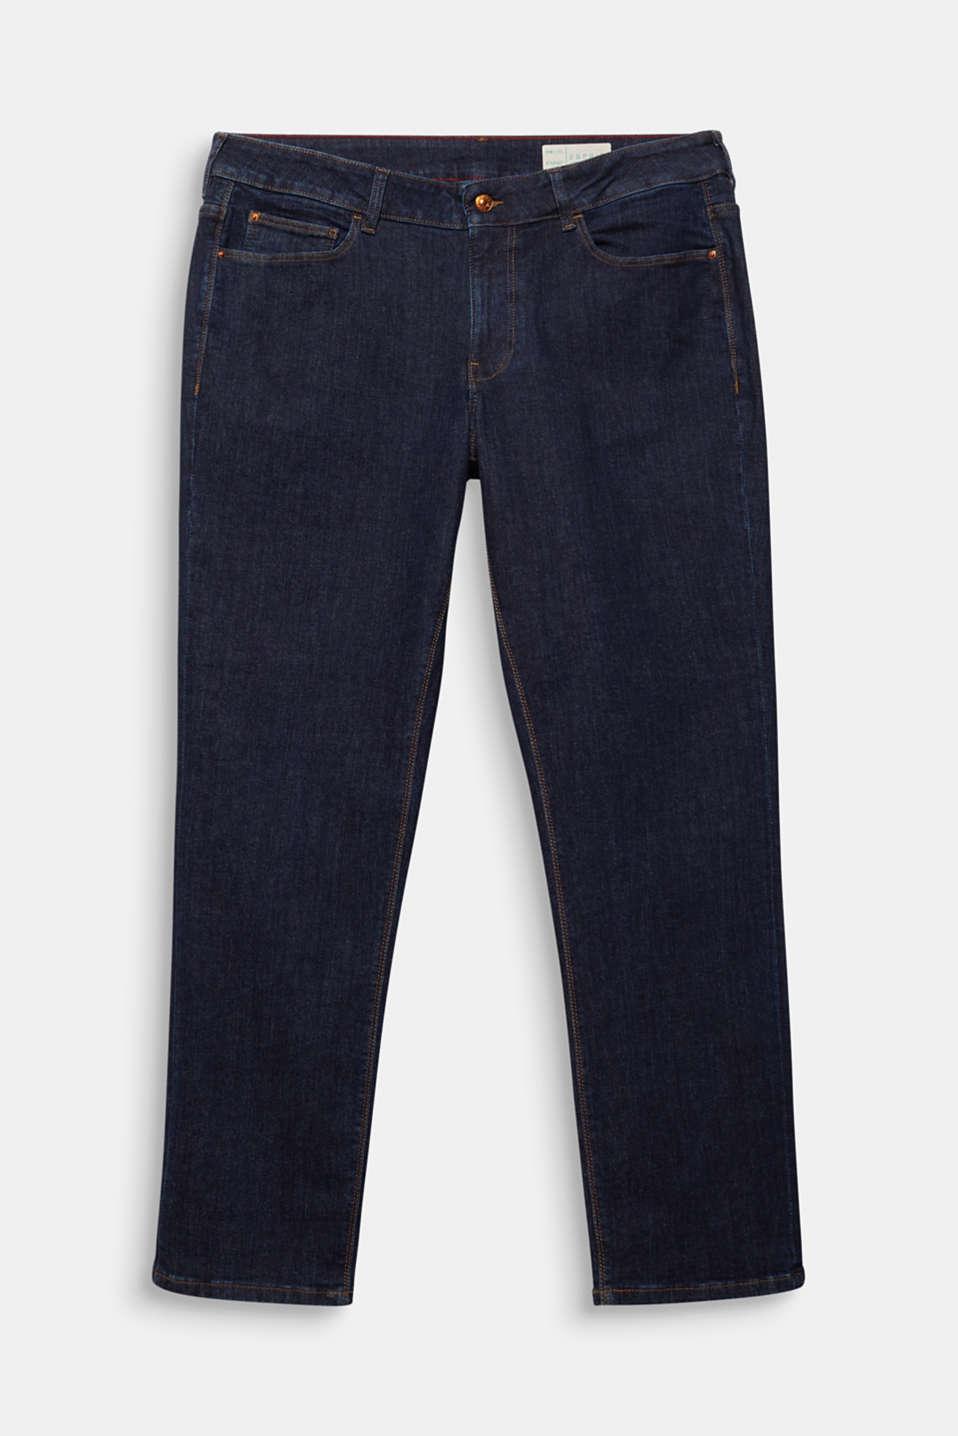 CURVY Basic-Jeans mit Stretchkomfort, BLUE RINSE, detail image number 7